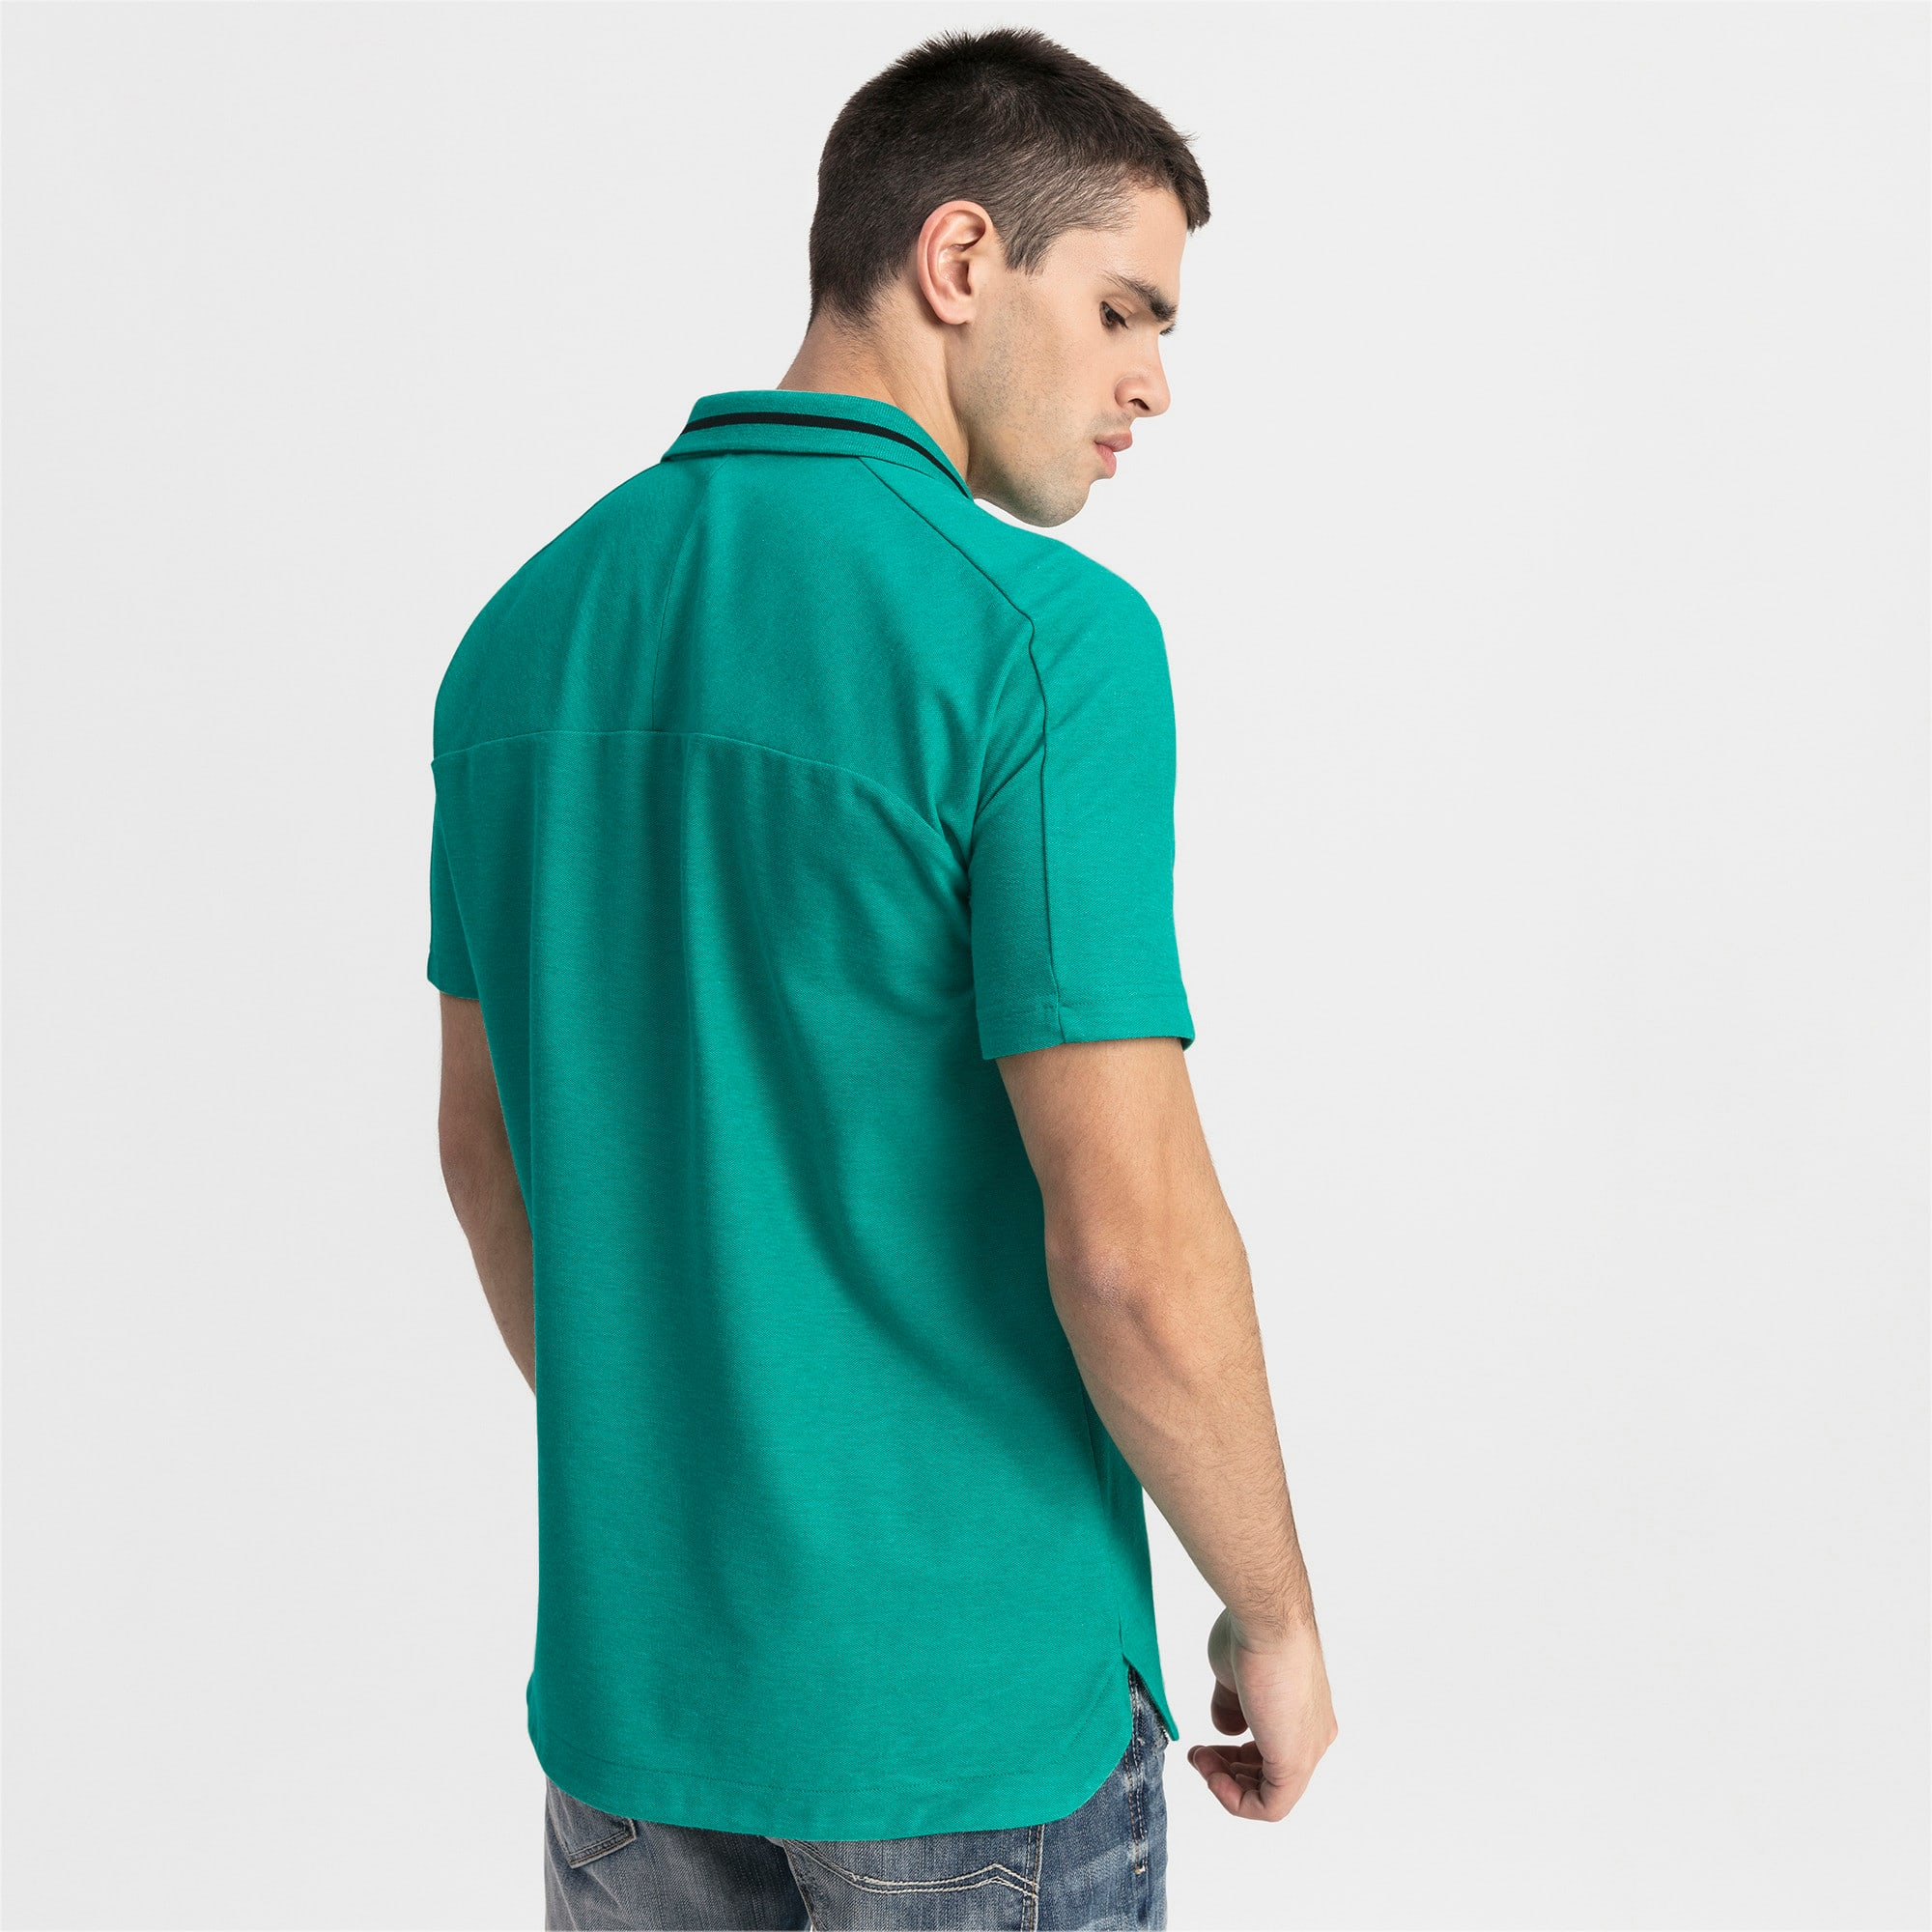 Thumbnail 2 of Mercedes AMG Petronas Men's Polo Shirt, Spectra Green Heather, medium